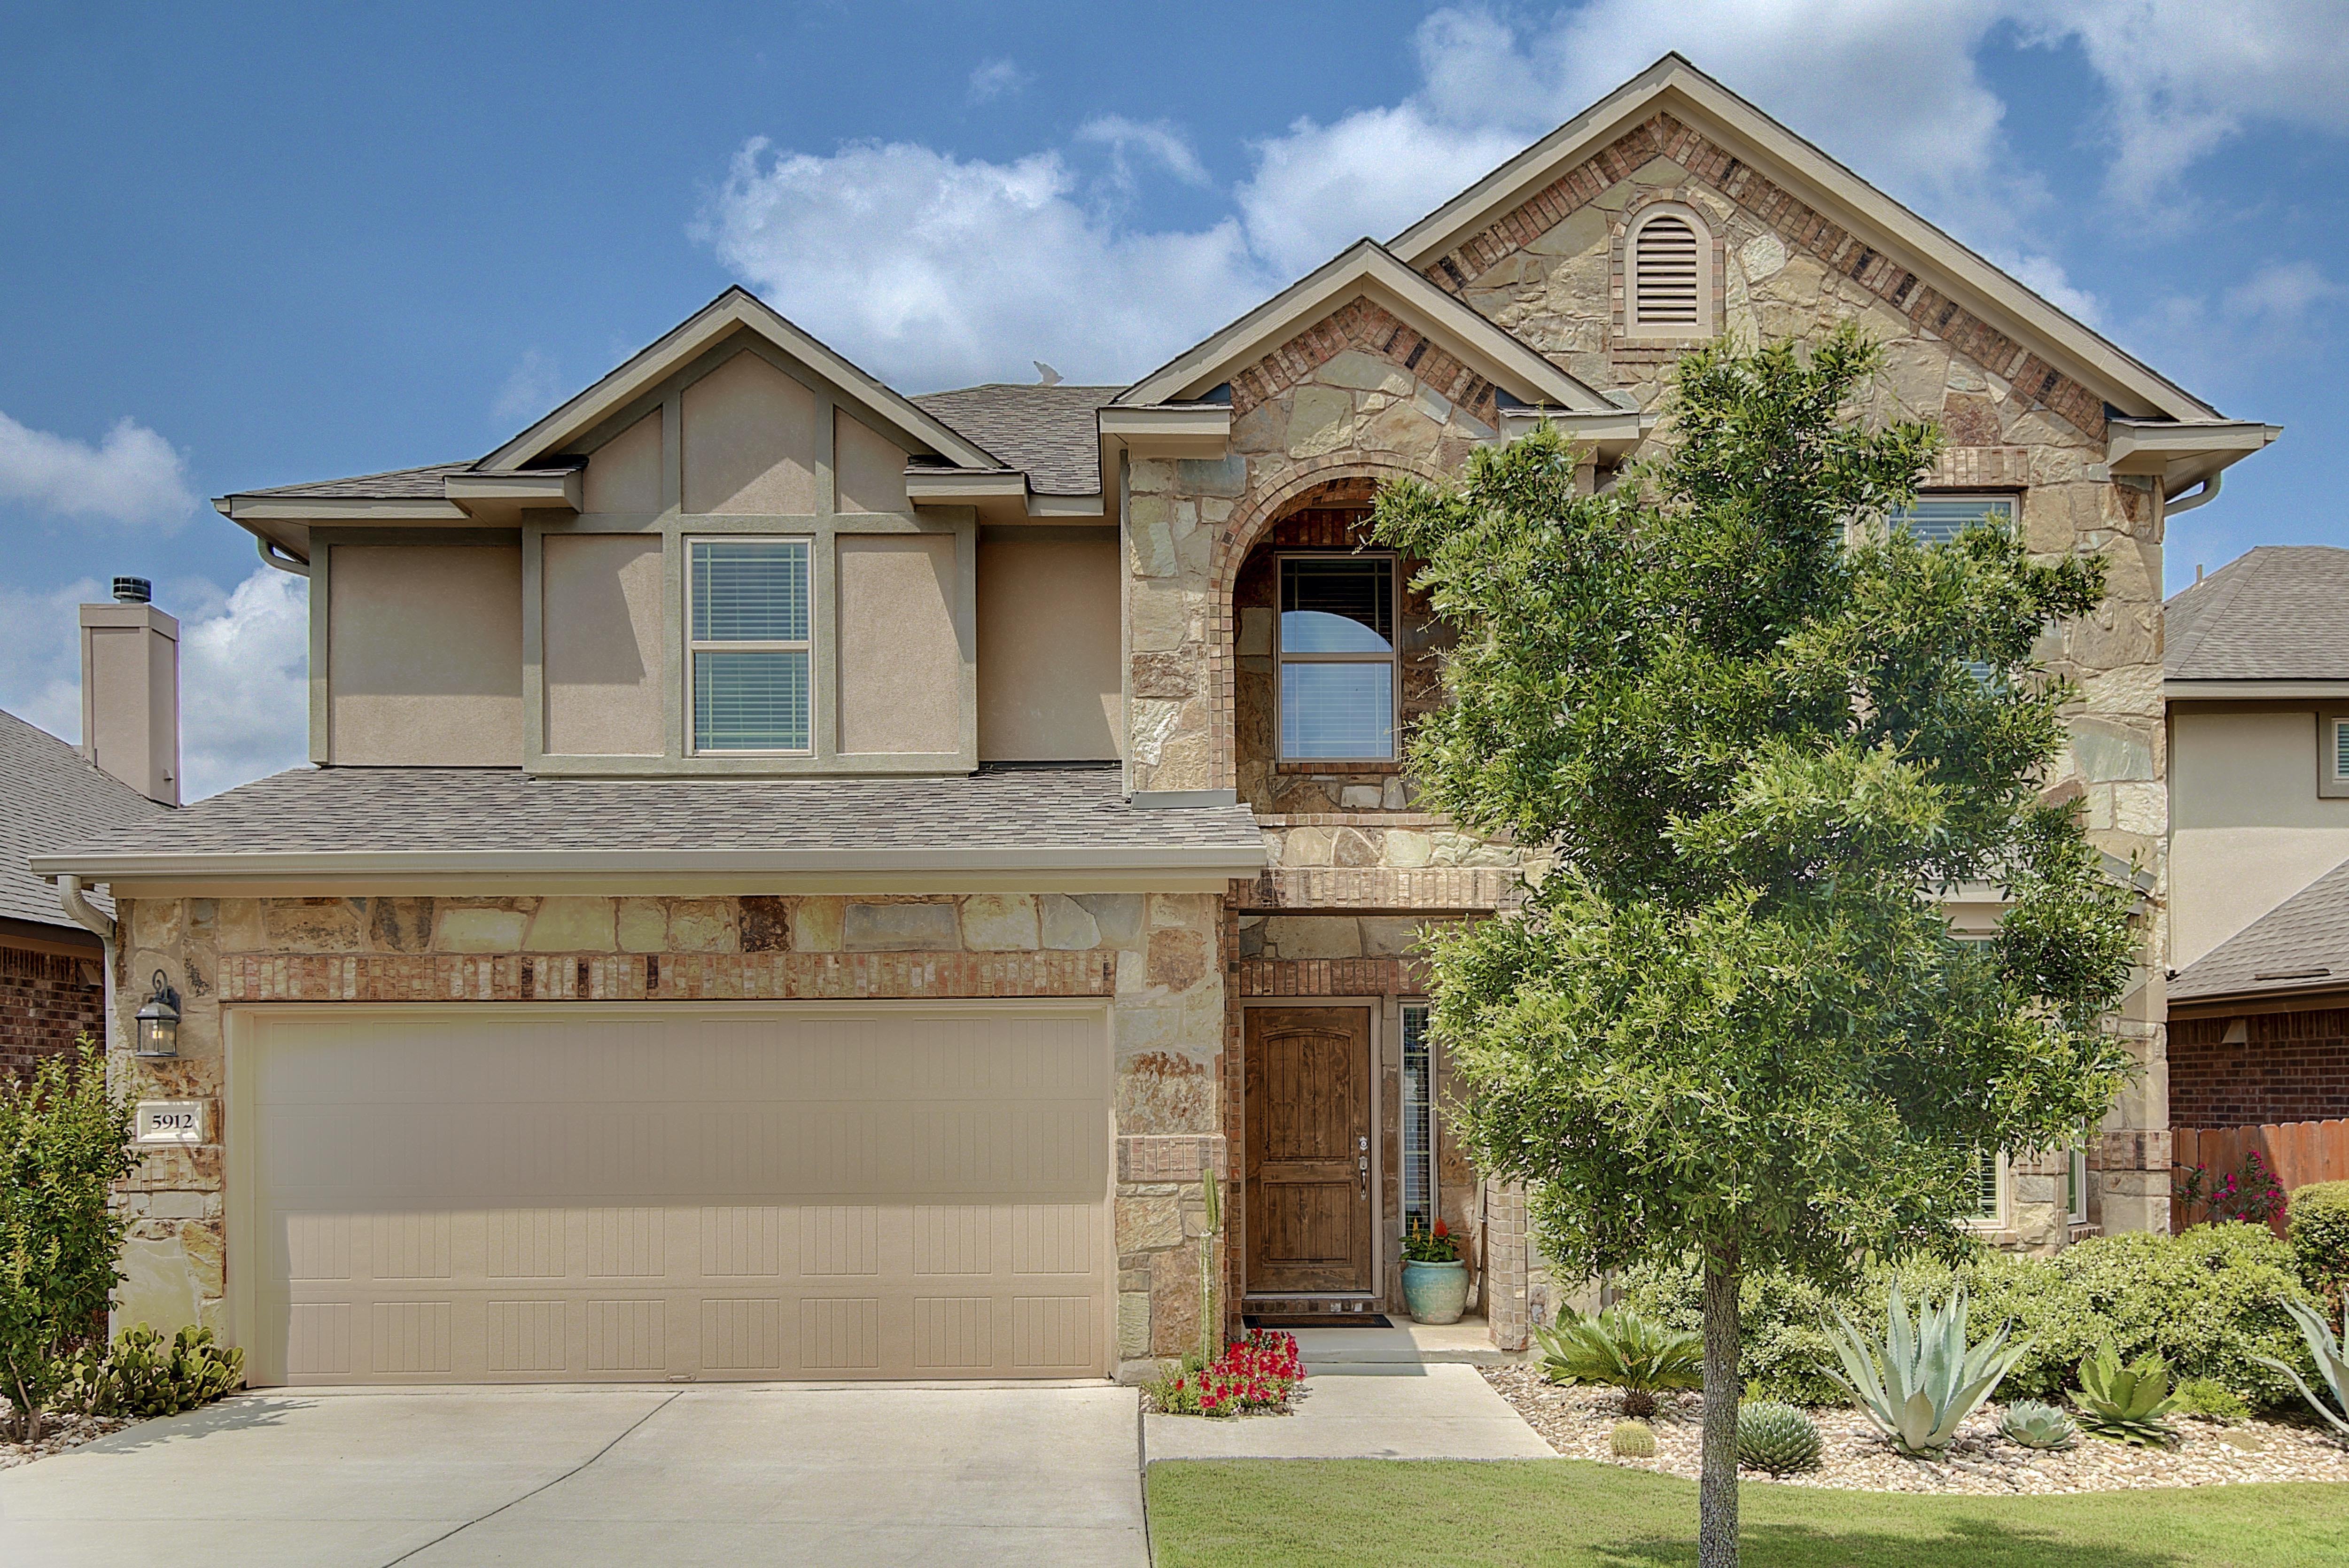 5912 Gunnison Turn Rd, Austin, TX